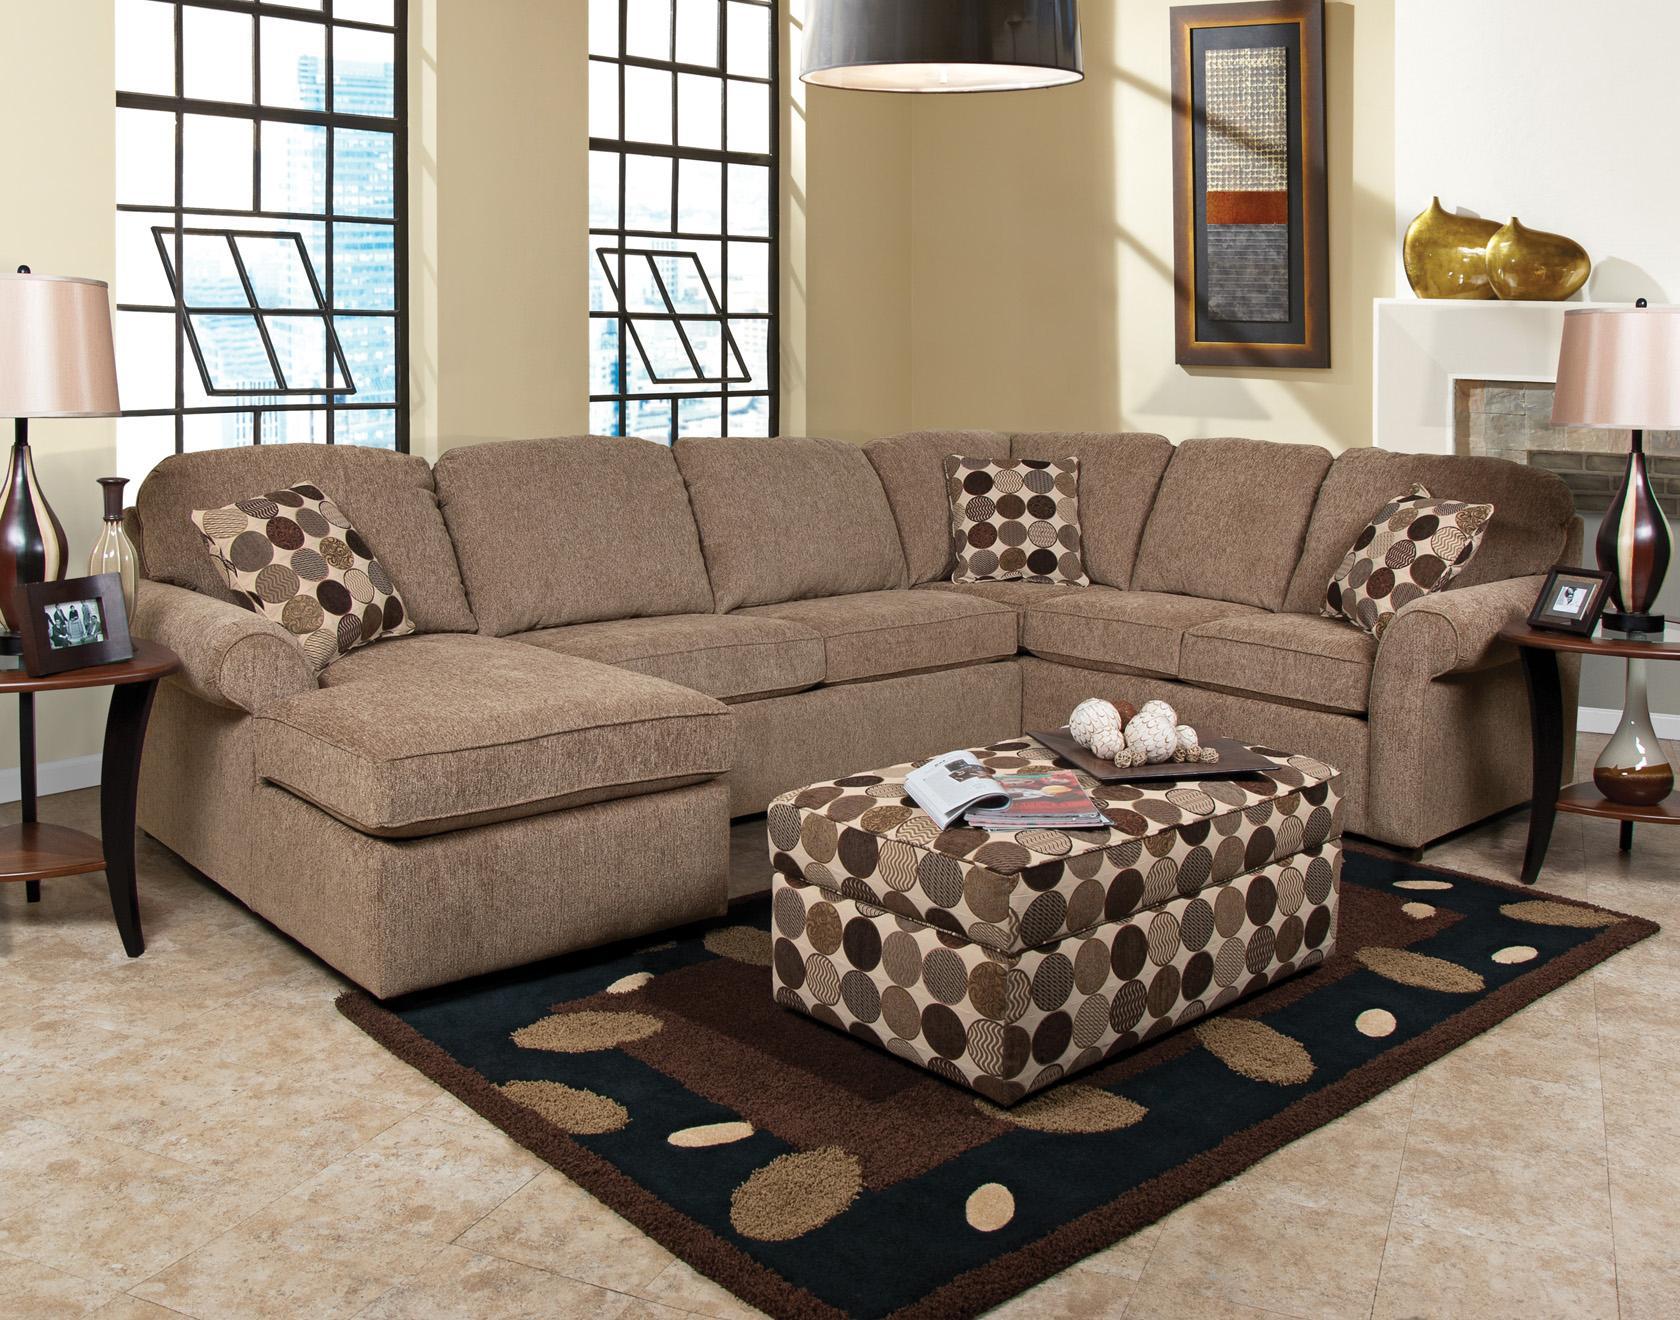 england sofa sleeper reviews orange brown sectional thomas with